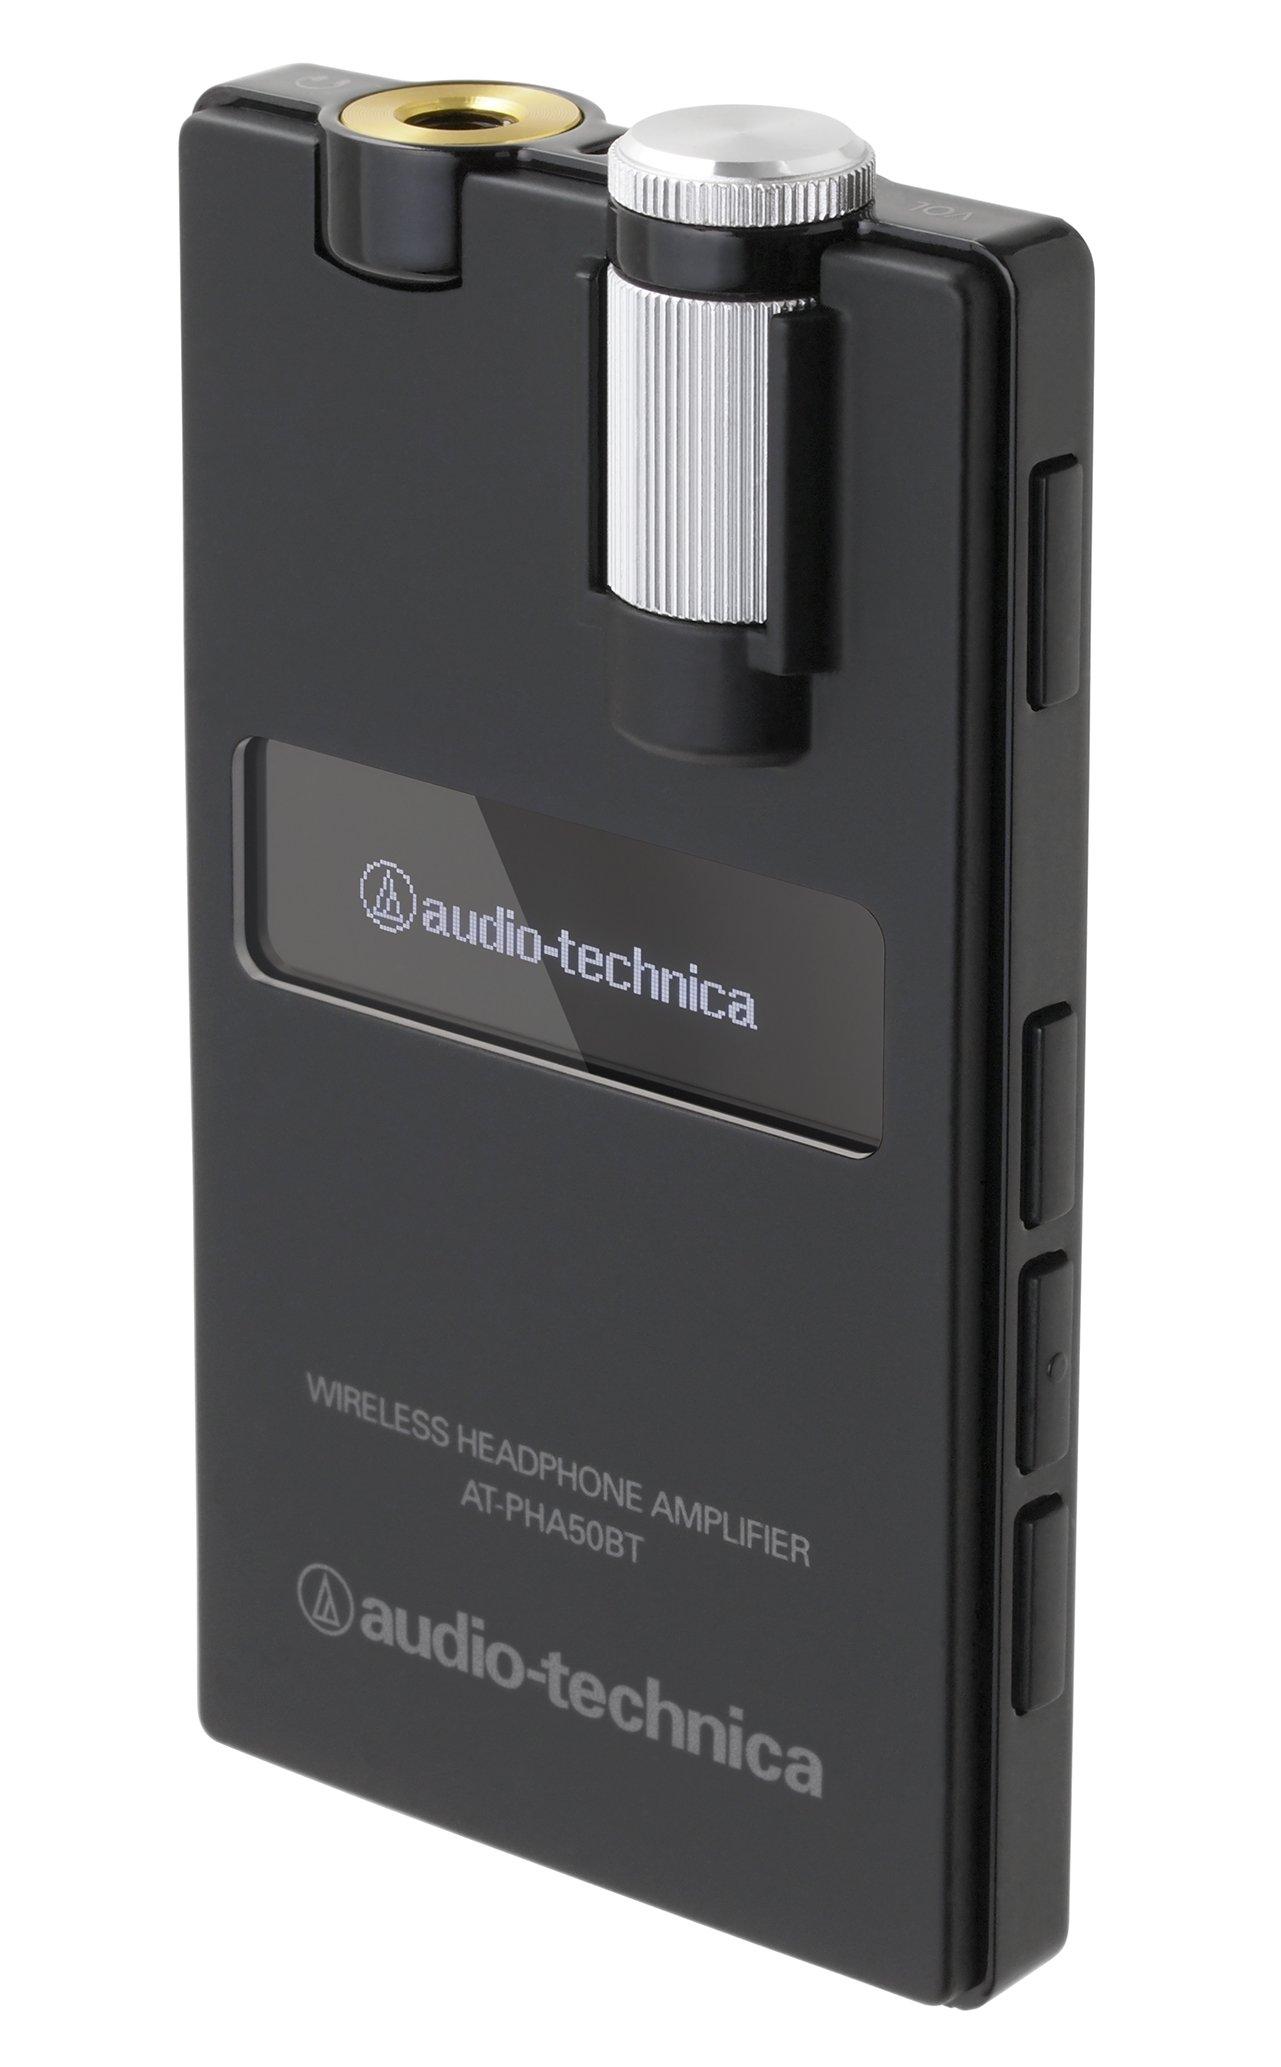 Audio-Technica wireless headphone amplifier black AT-PHA50BT BK [Japan import]